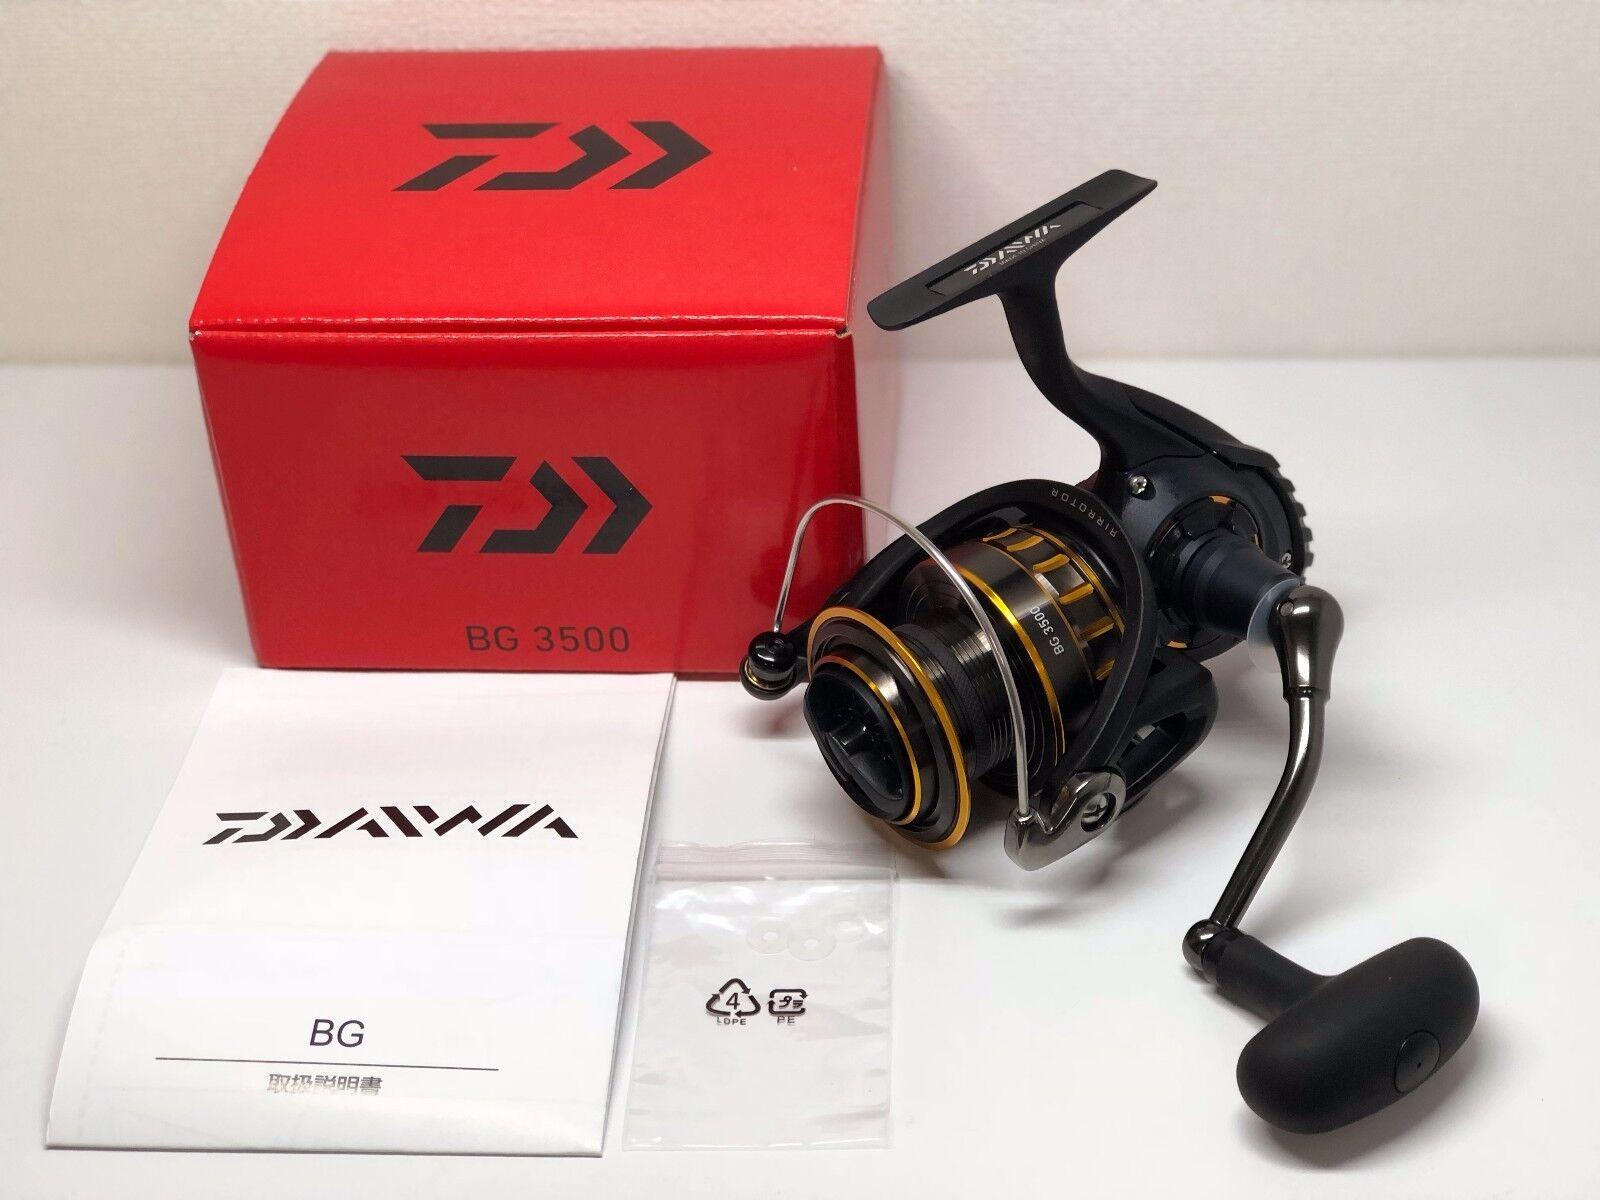 DAIWA 16 BG 3500    Free Shipping from Japan